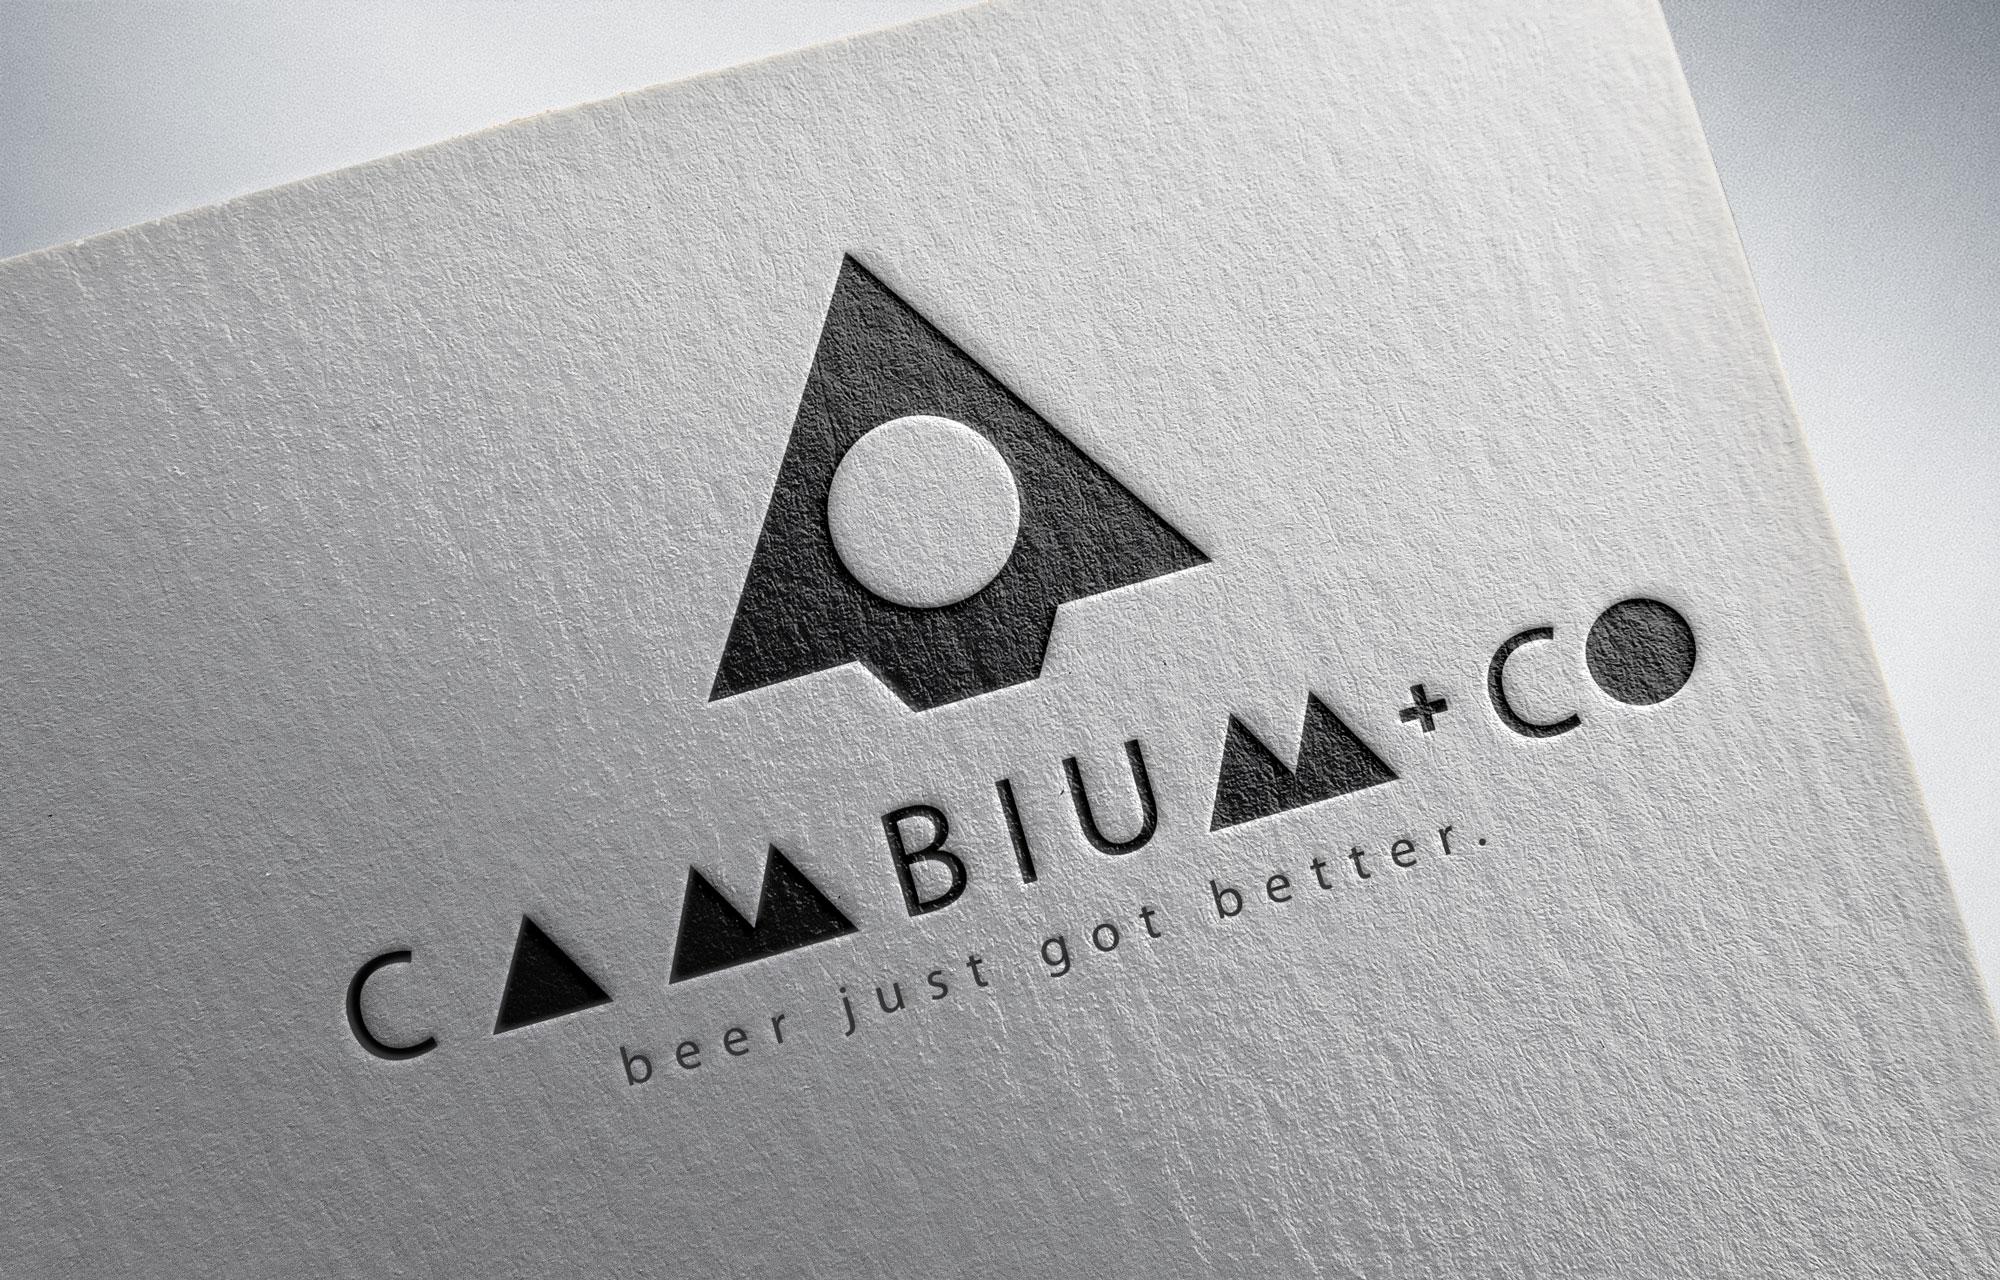 rustic modern logo, logomark, rustic logo, hipster logo, logo design, millennial logo, graphic design, branding, rustic modern branding, letterpress logo, business card designer.